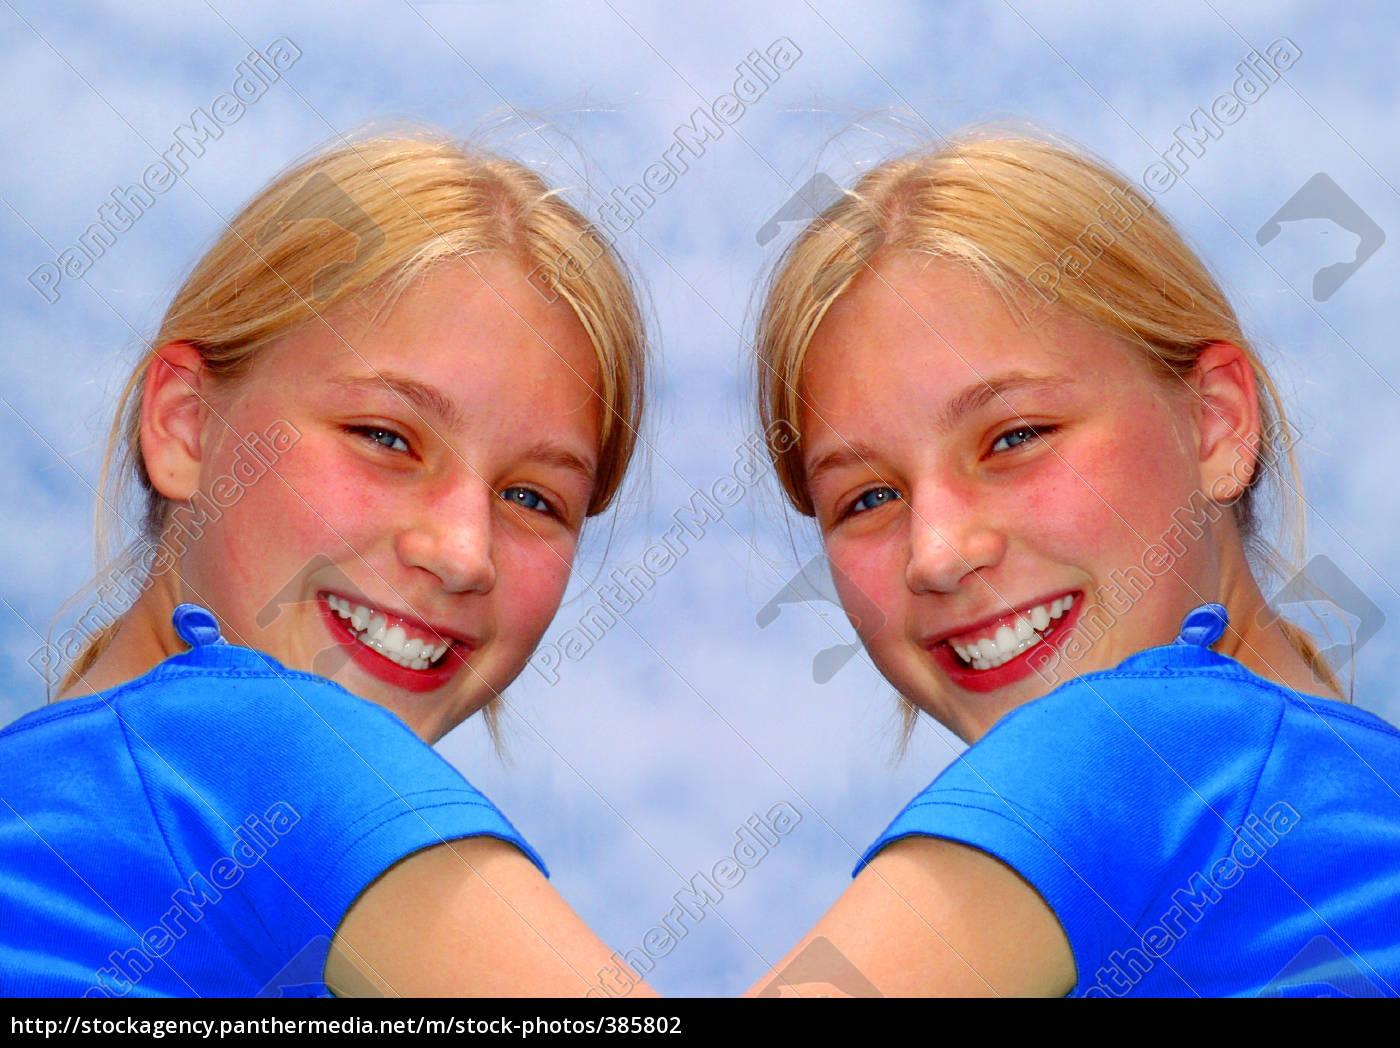 zwillinge - 385802